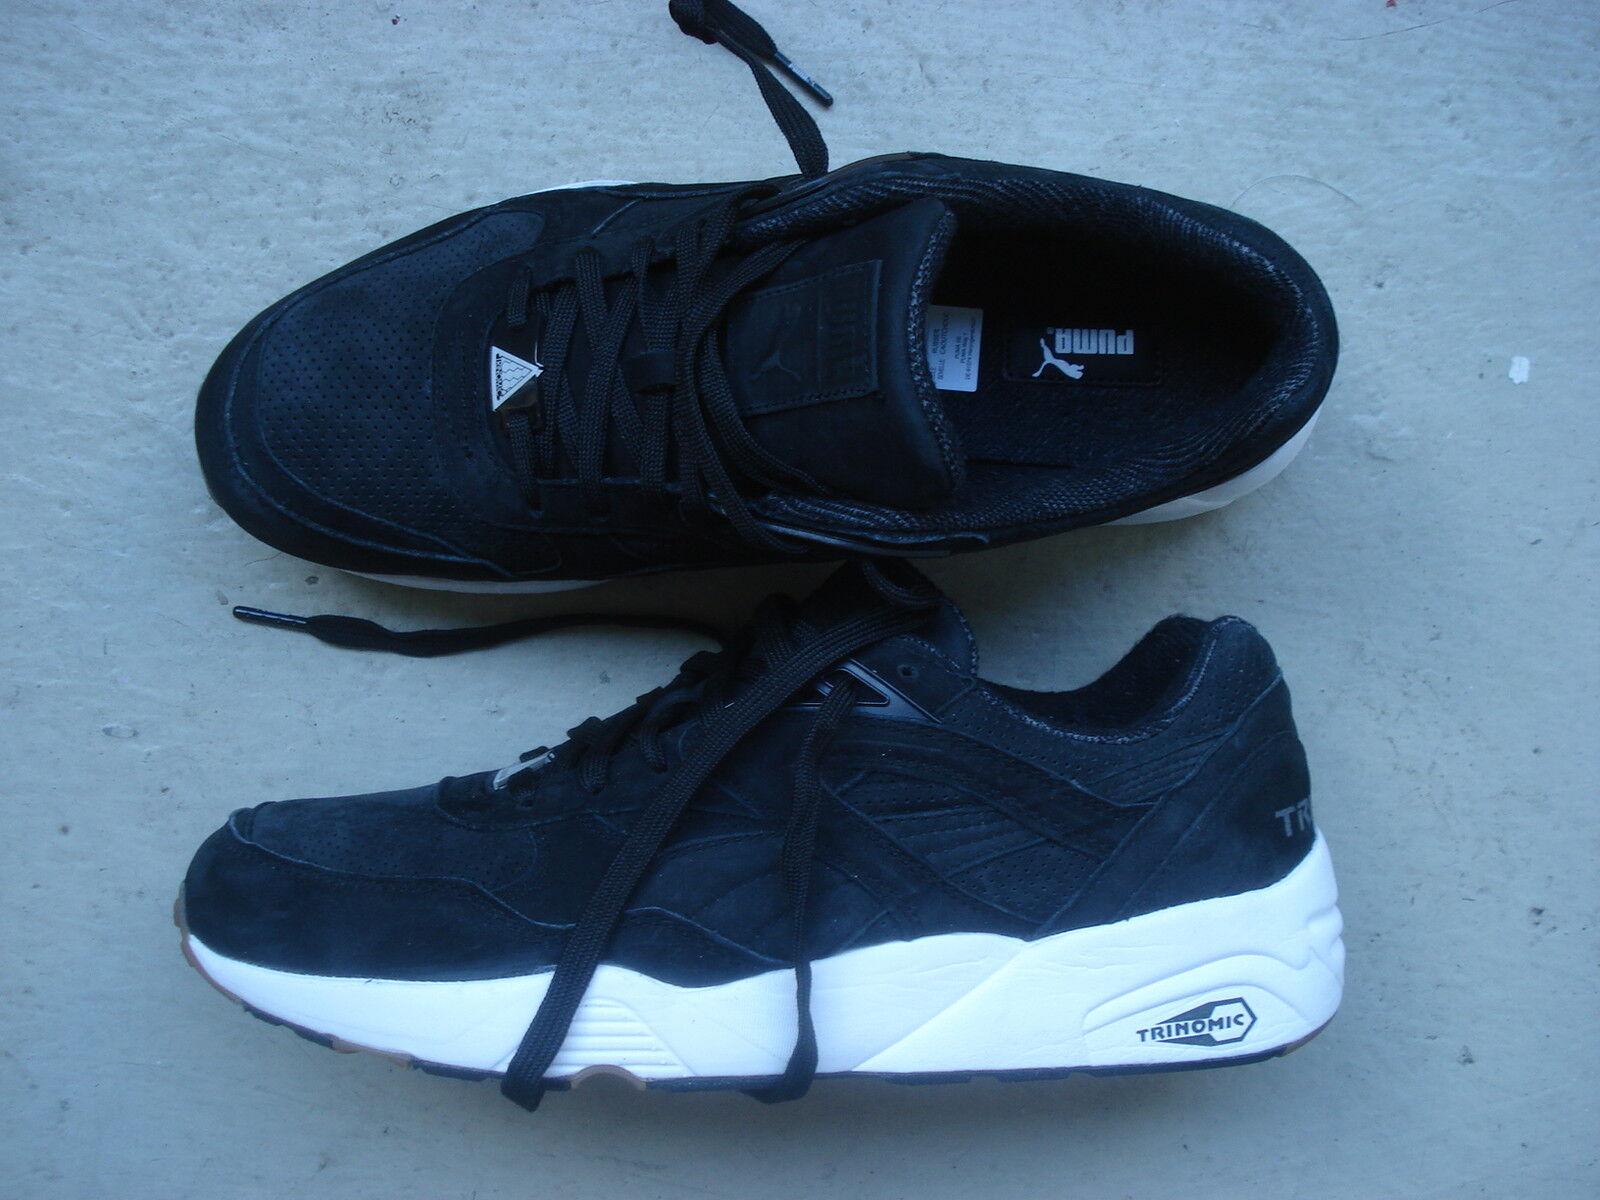 Puma trinomic R 698  PERF Pack  44.5 negro blanco